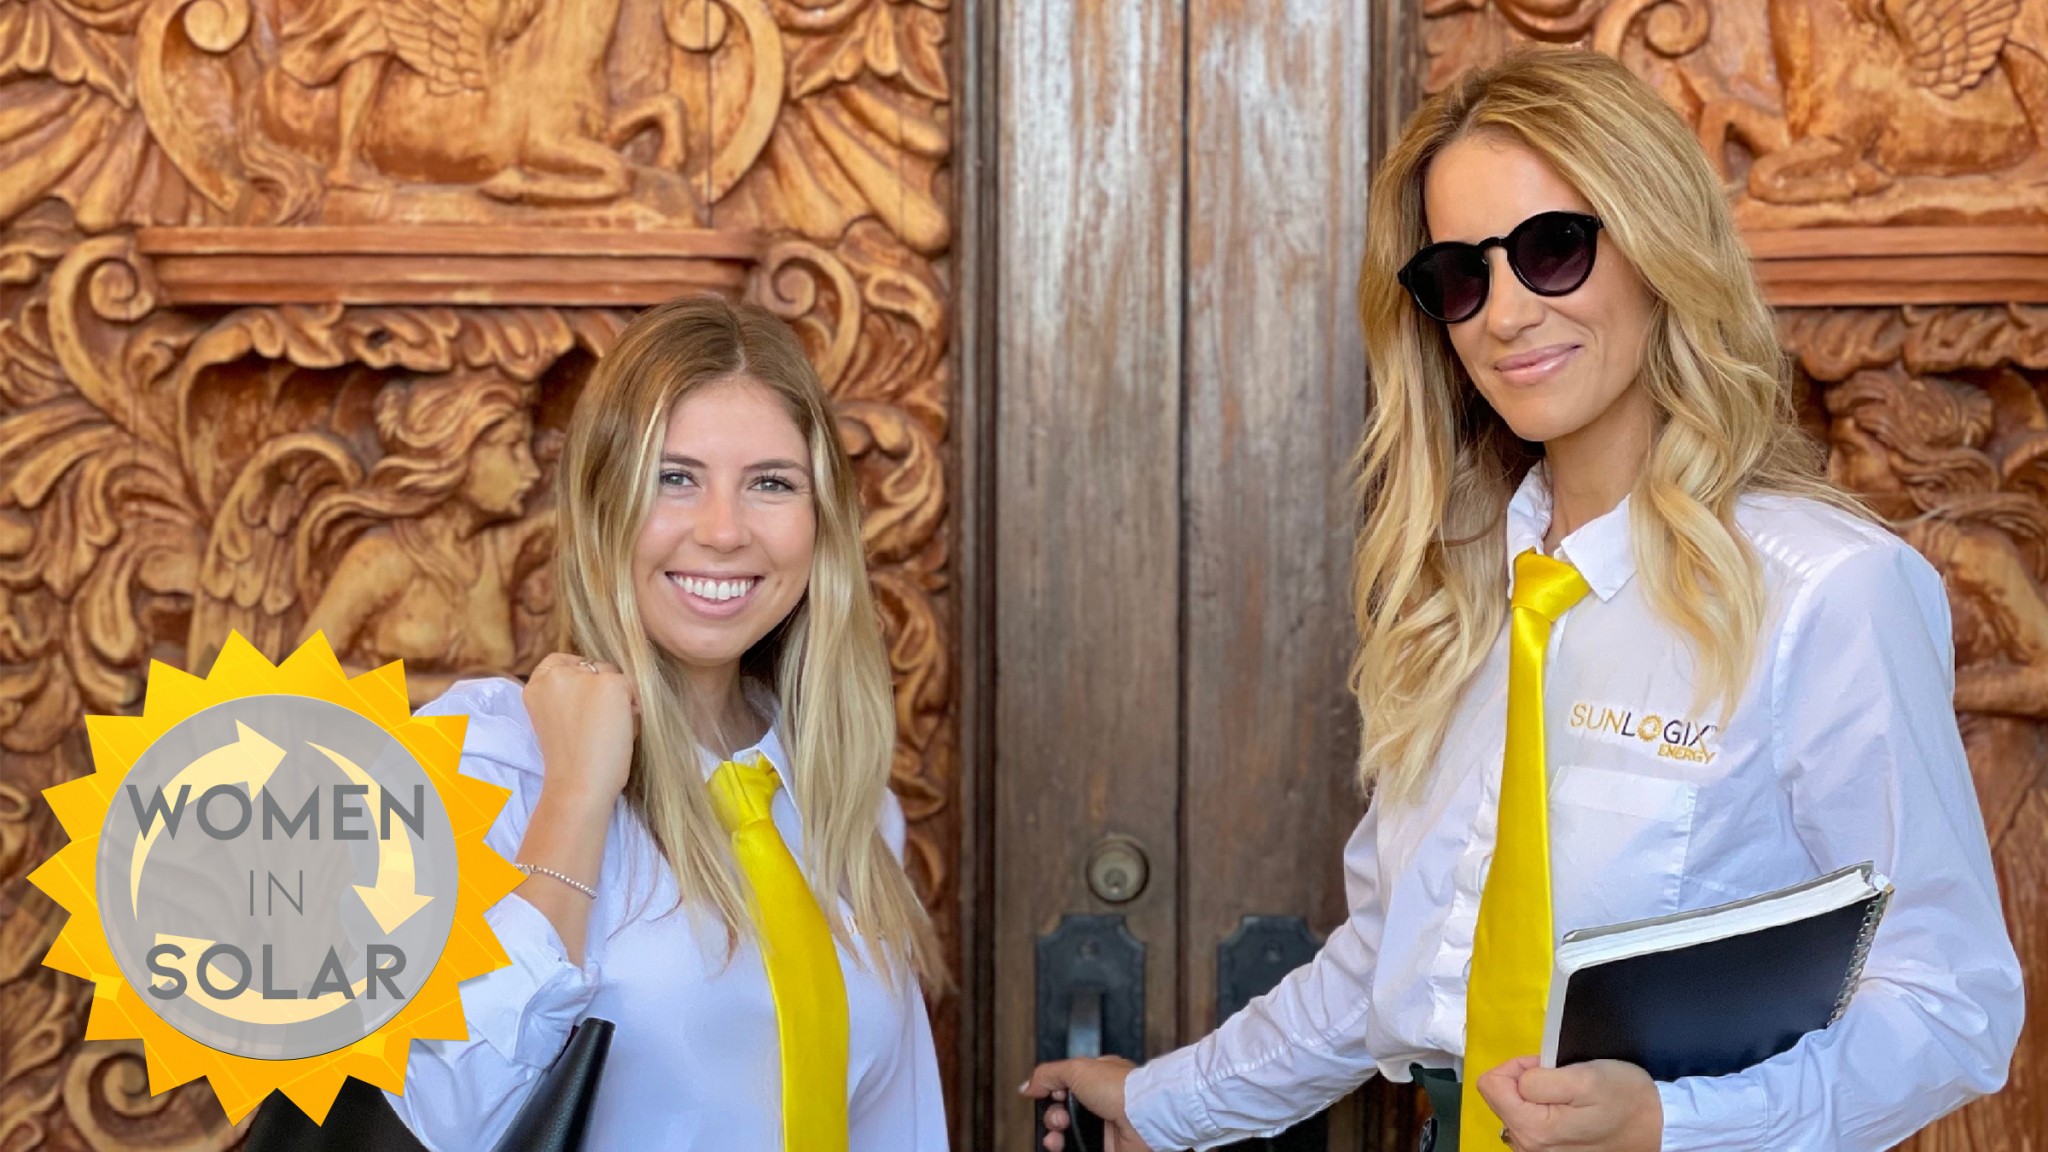 successful women in solar